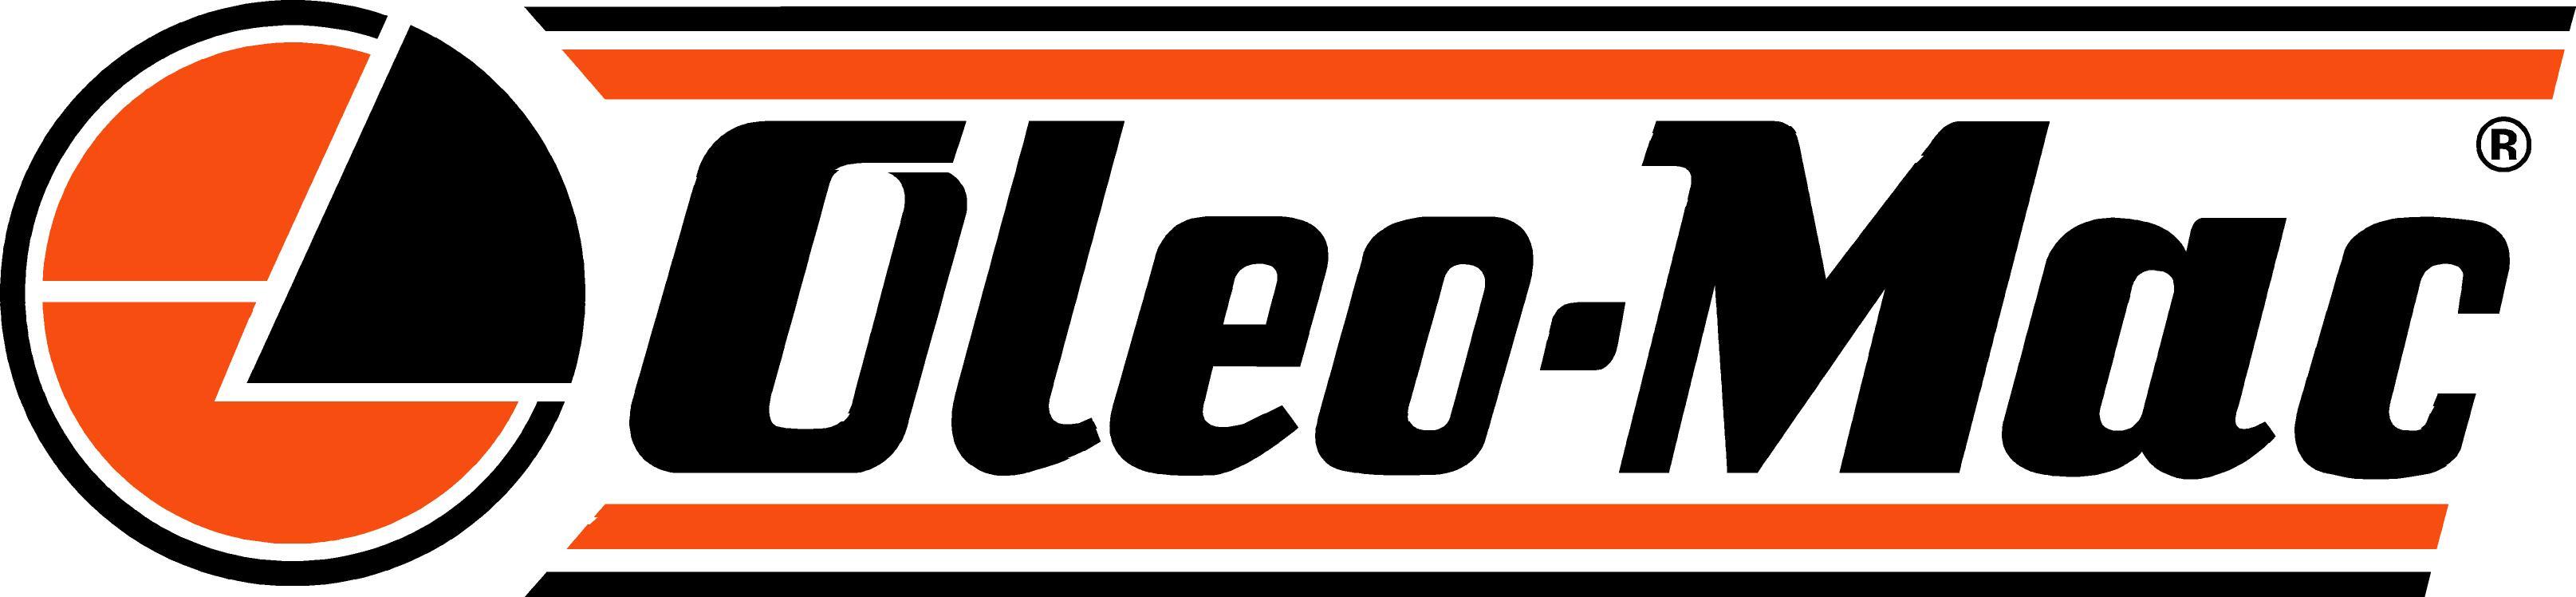 oleomac logo